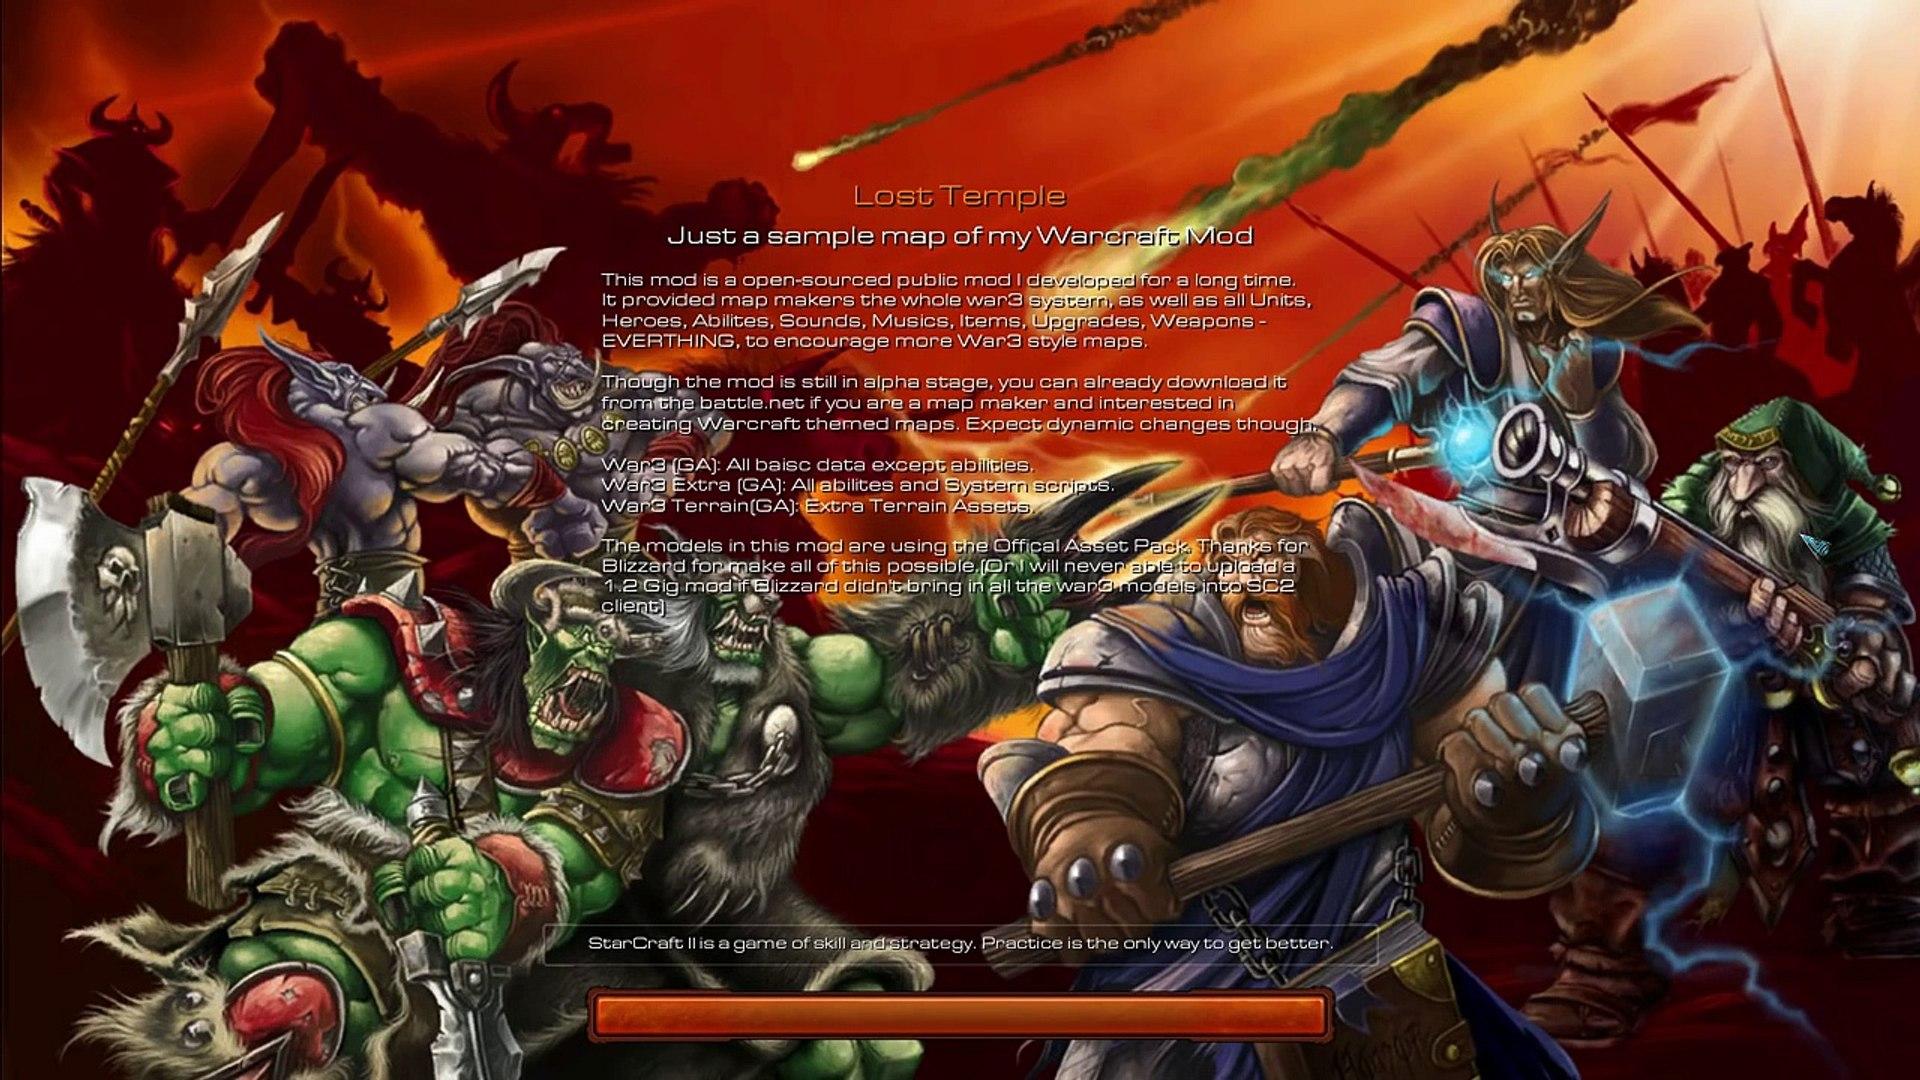 StarCraft II - Warcraft III Mod 2vs2 randomien kanssa